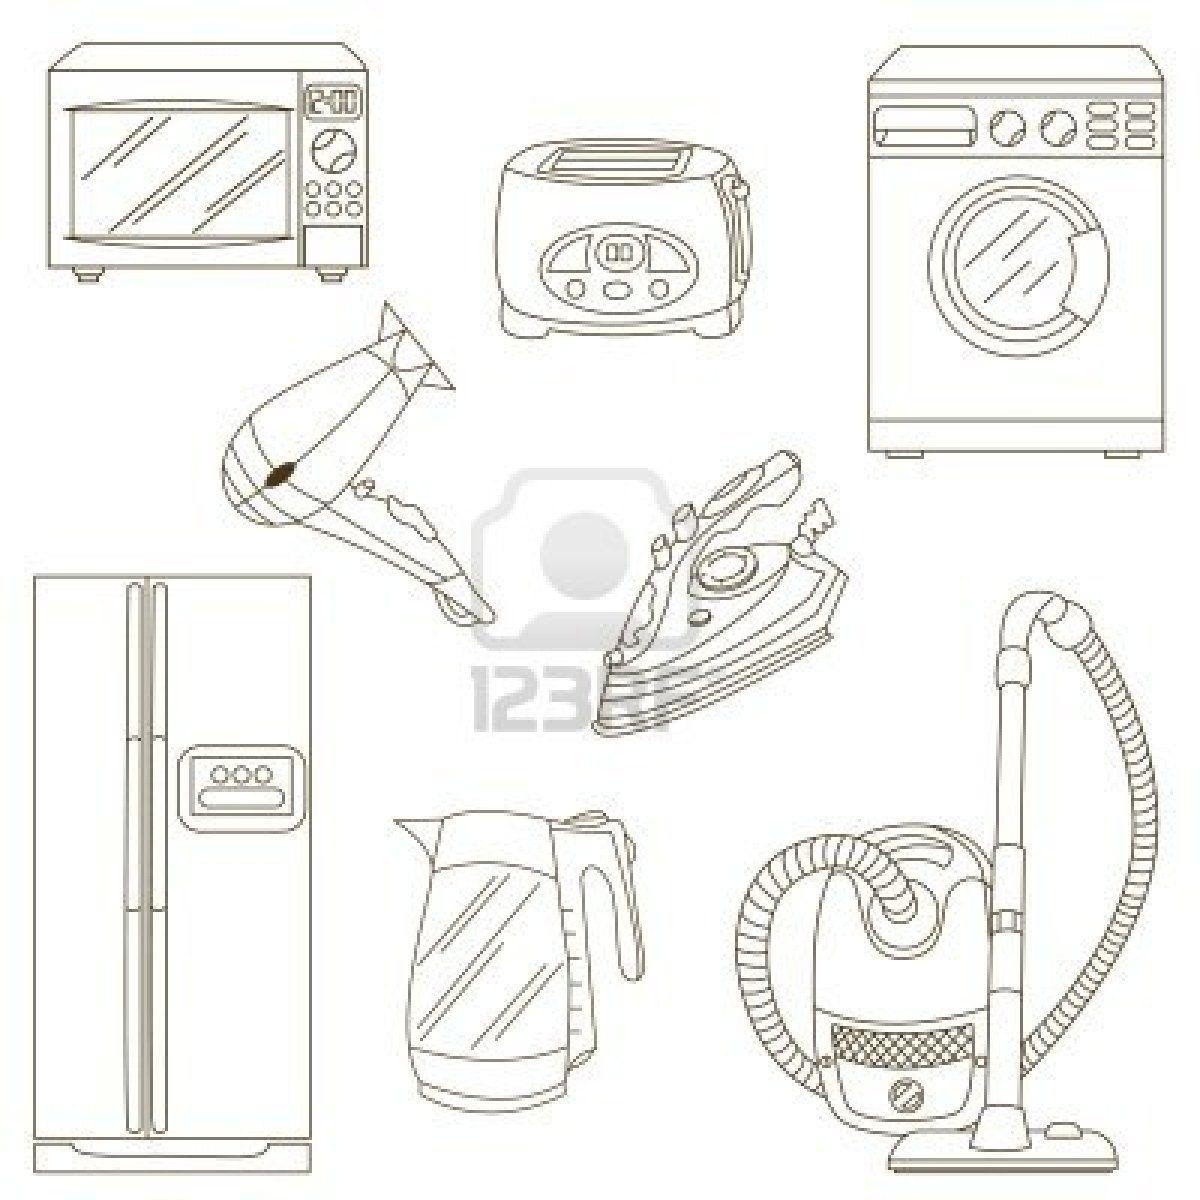 Dibujo Electrodomesticos Buscar Con Google Dibujos